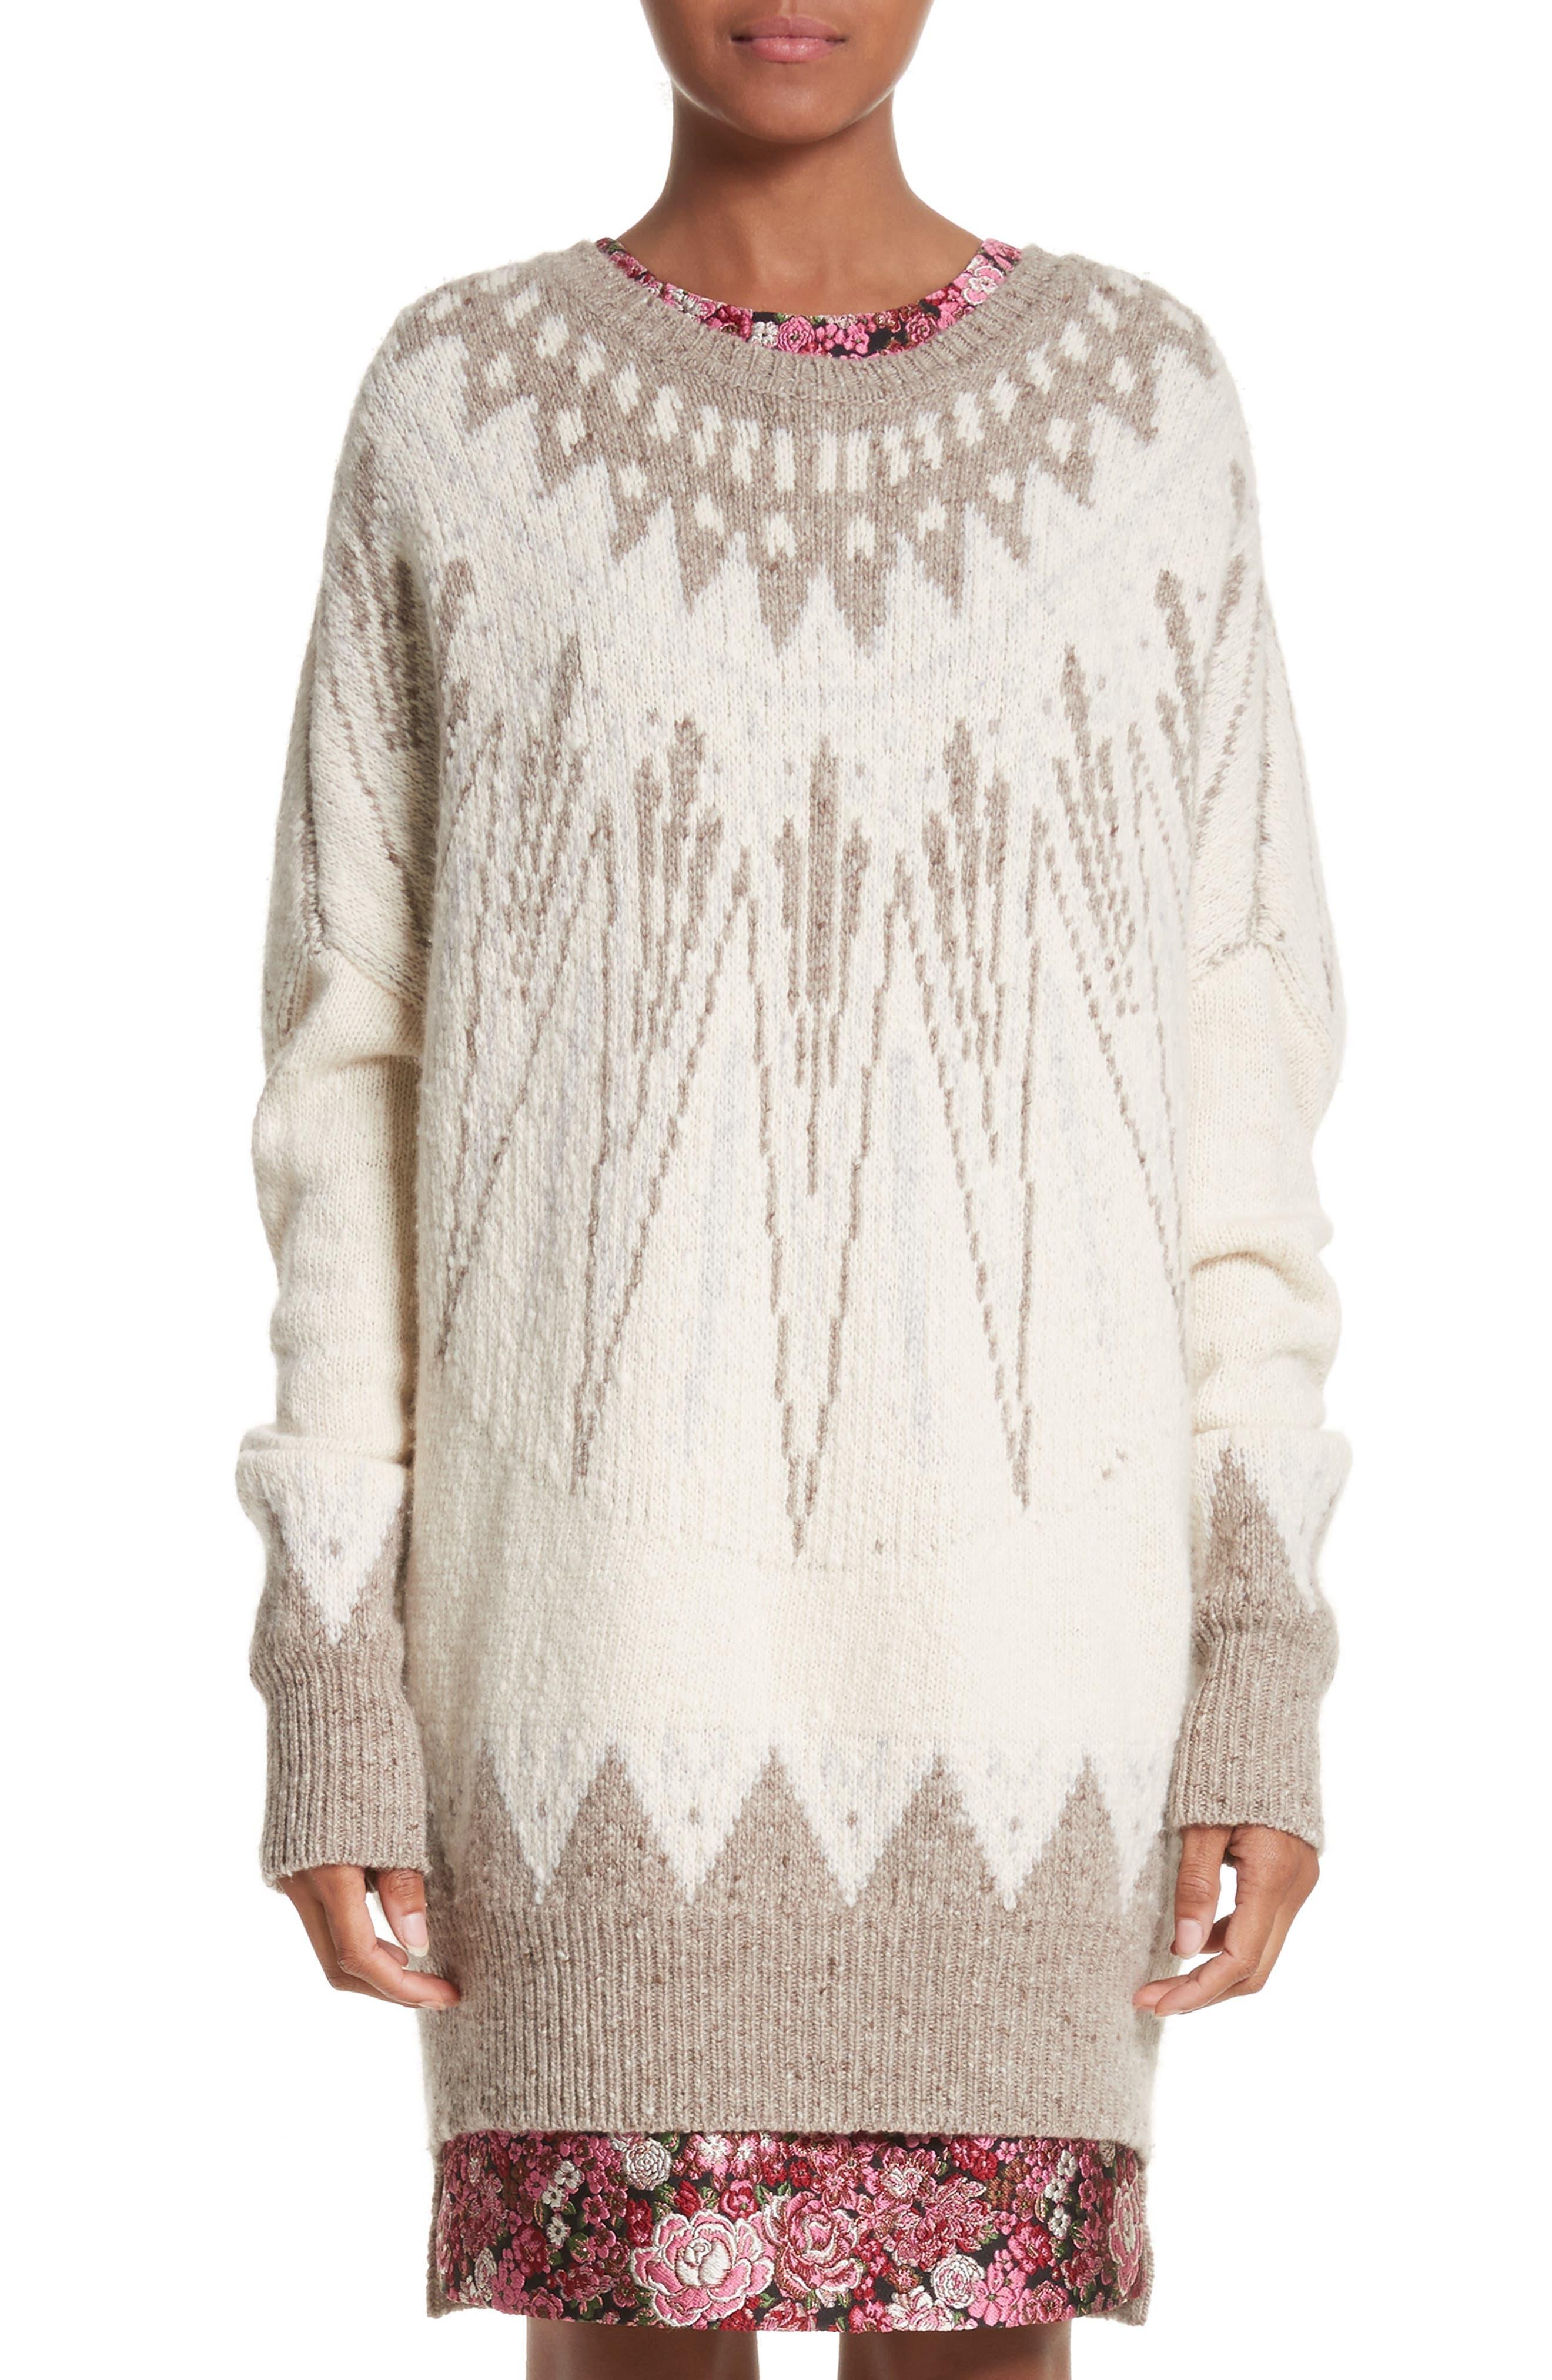 Marled Merino Wool & Cashmere Fair Isle Sweater,                             Main thumbnail 1, color,                             900